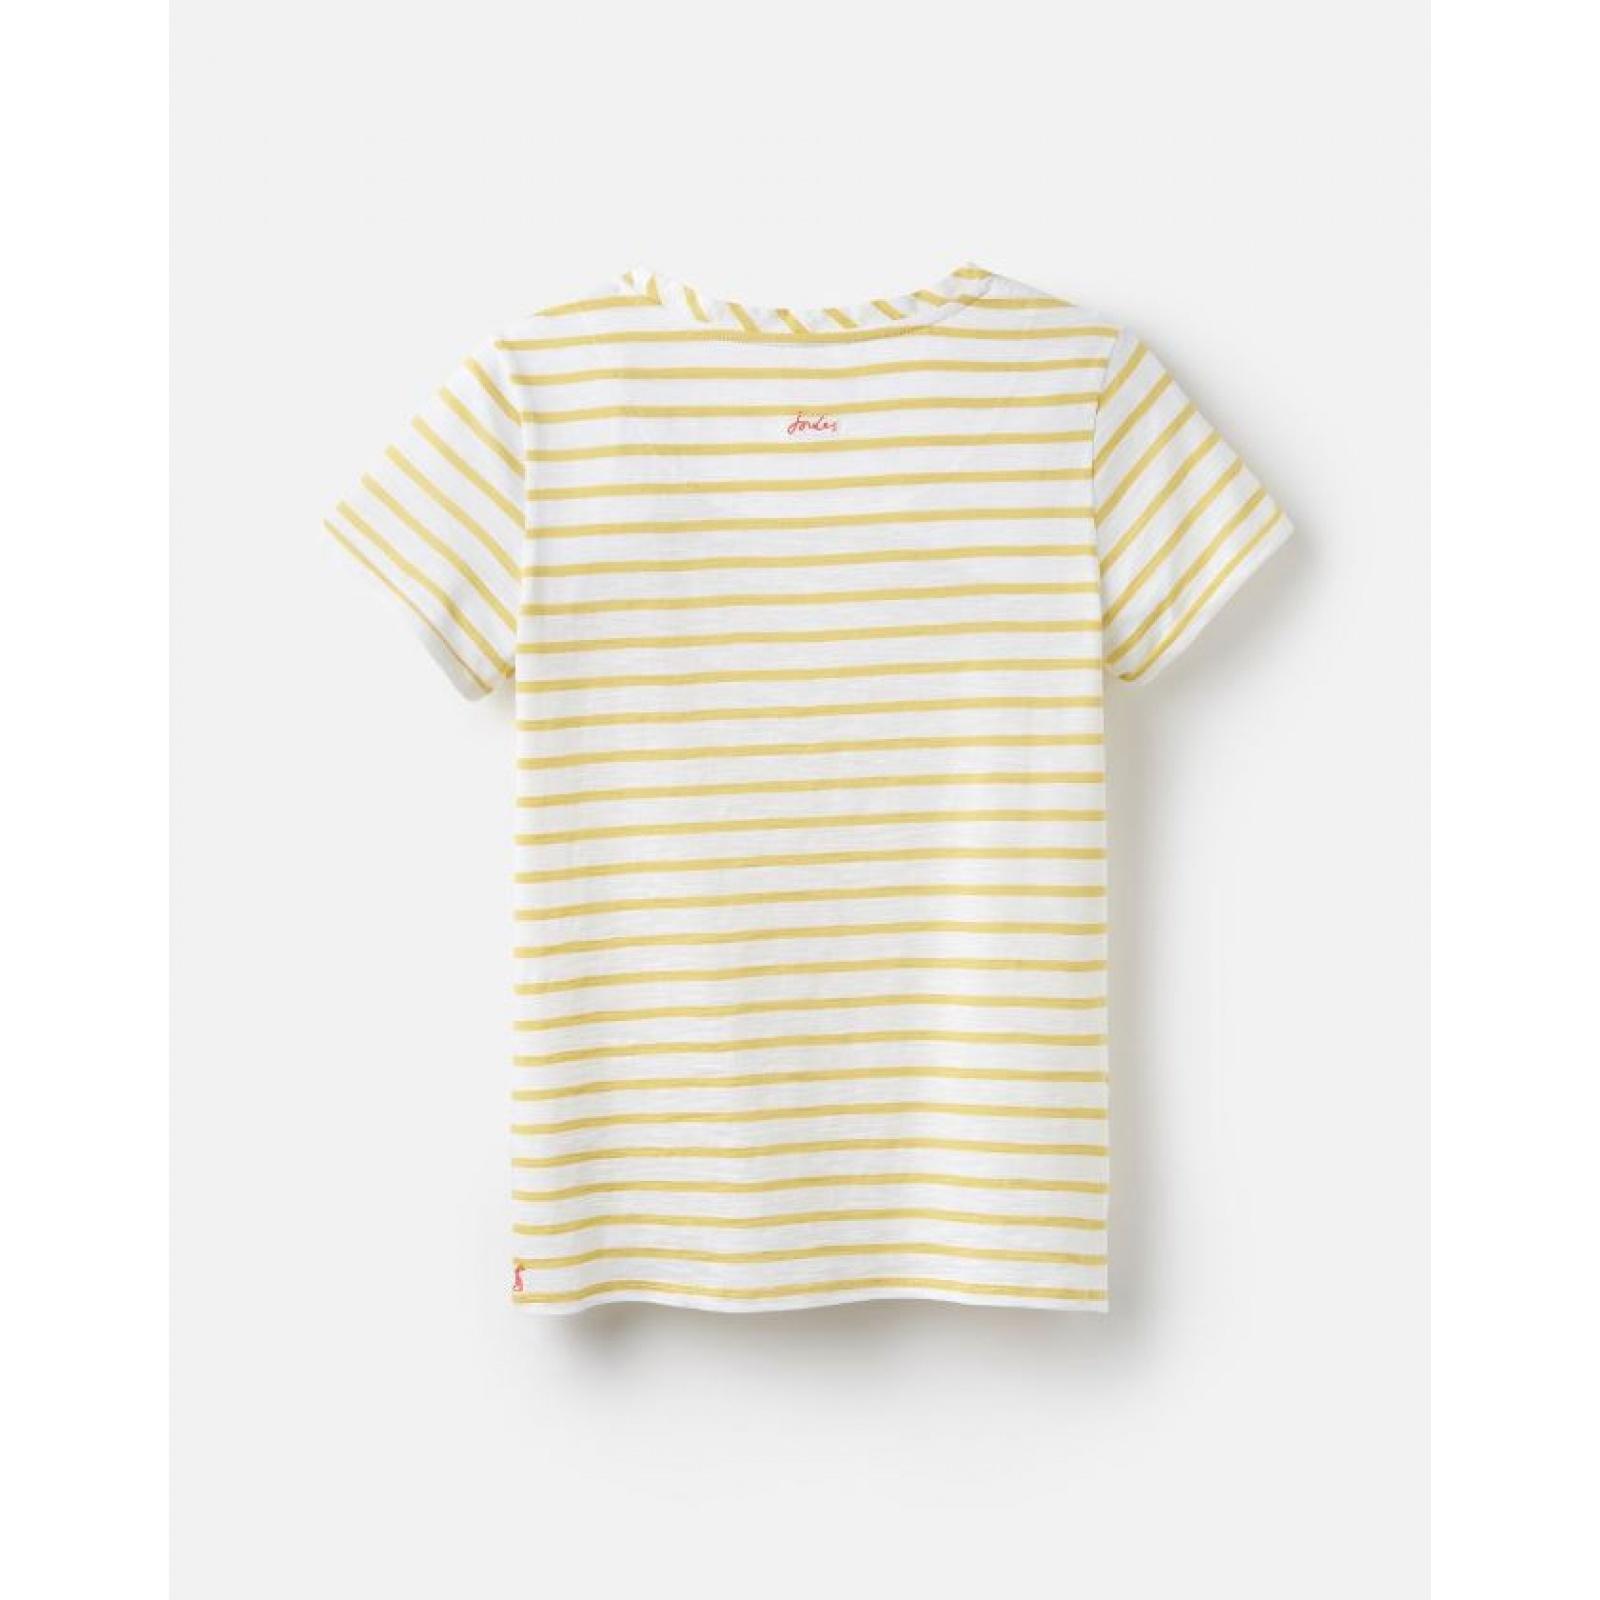 Joules-Nessa-Raya-Ligero-Jersey-Camiseta-SS19 miniatura 29